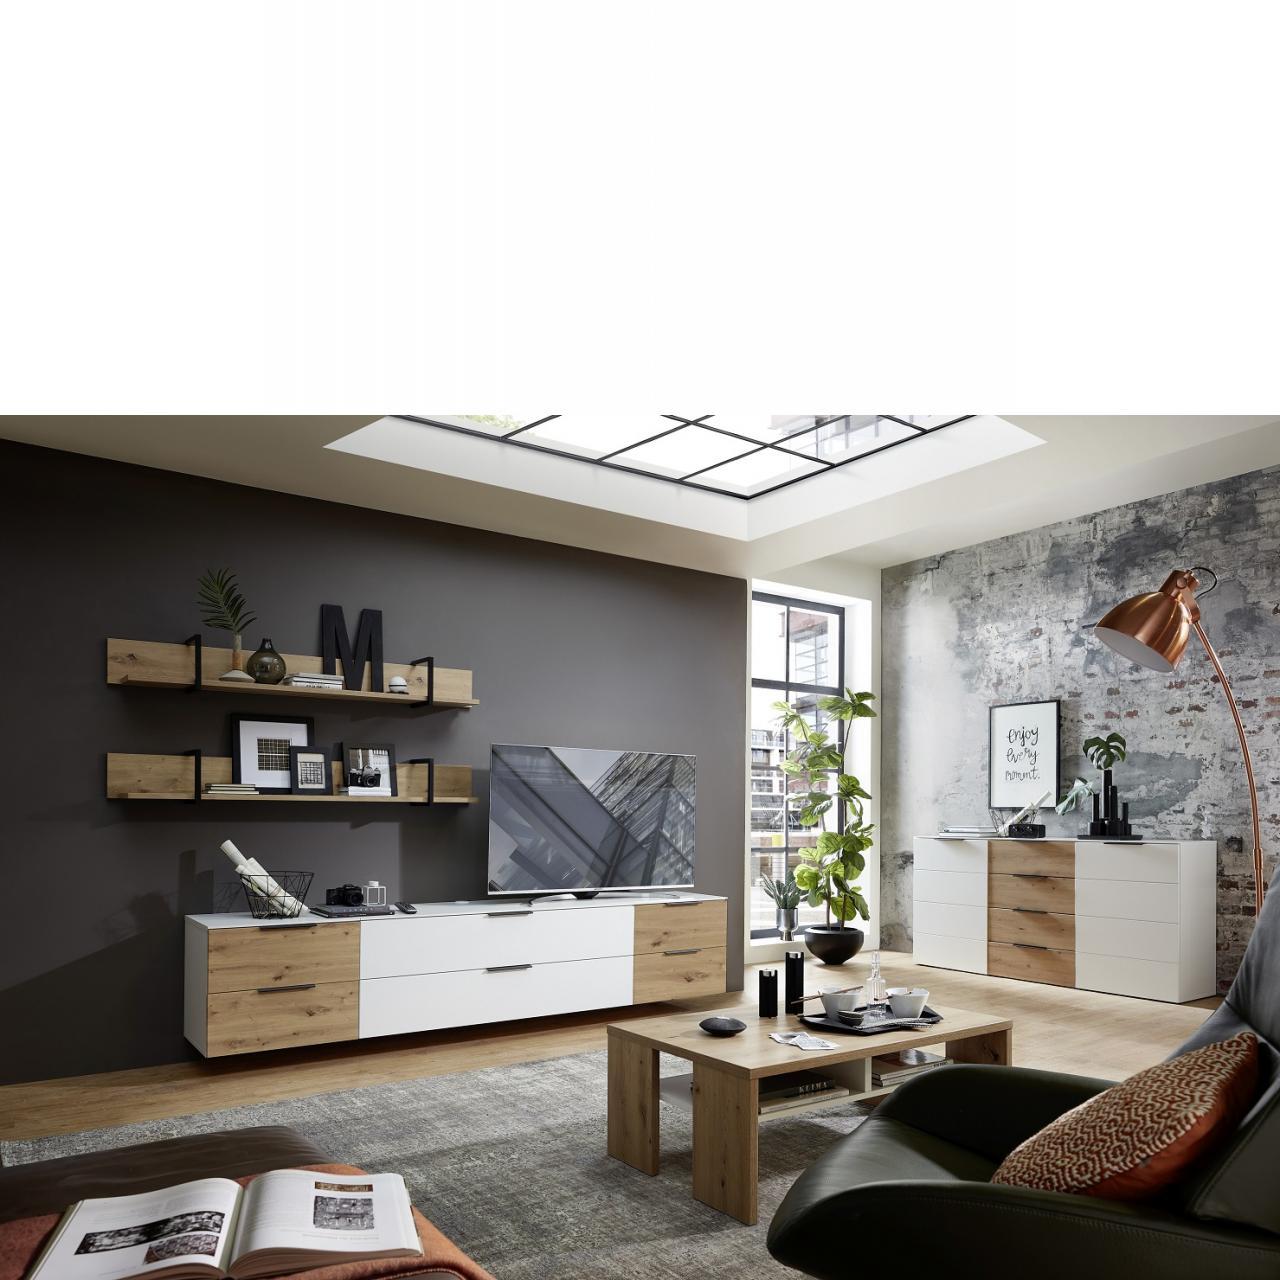 Wohnwand Mediana Artisan Eiche Nb. Weiß 3-teilig MDF inkl. LED Beleuchtung